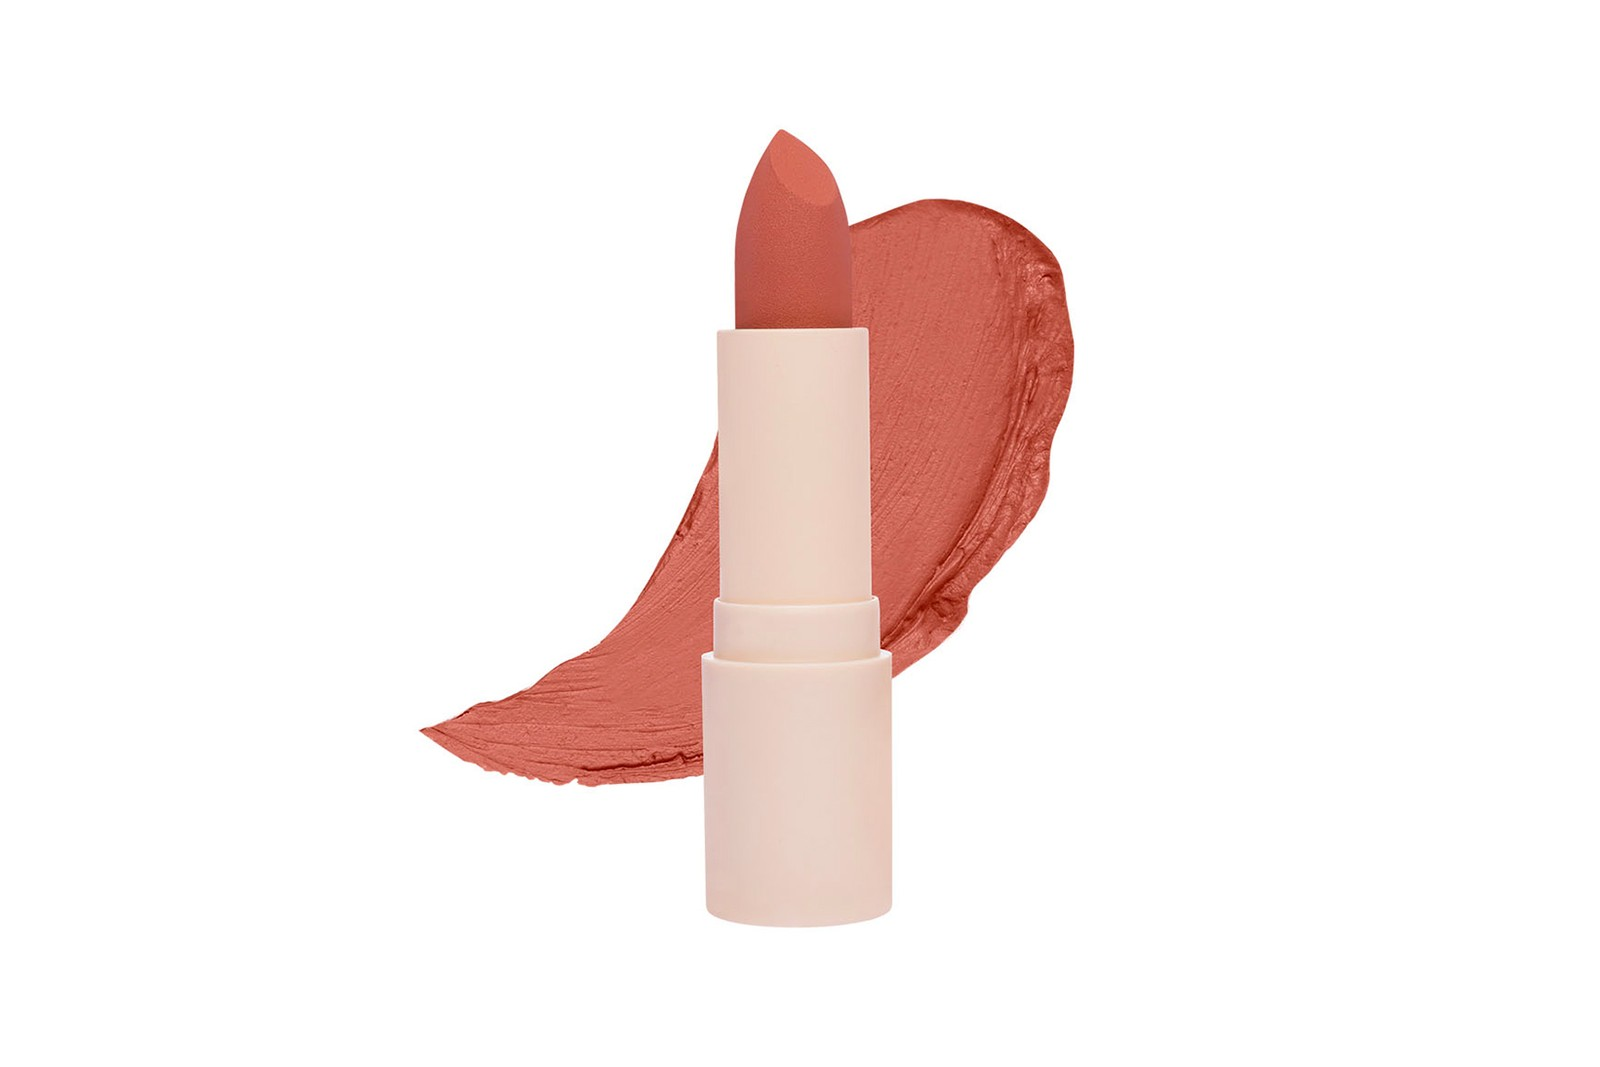 sunnies face fluffmatte lip dip lipsticks airblush blush lifebrow eyebrow pencil gel glowboss highlighter play paint nail polish makeup yellow pouch